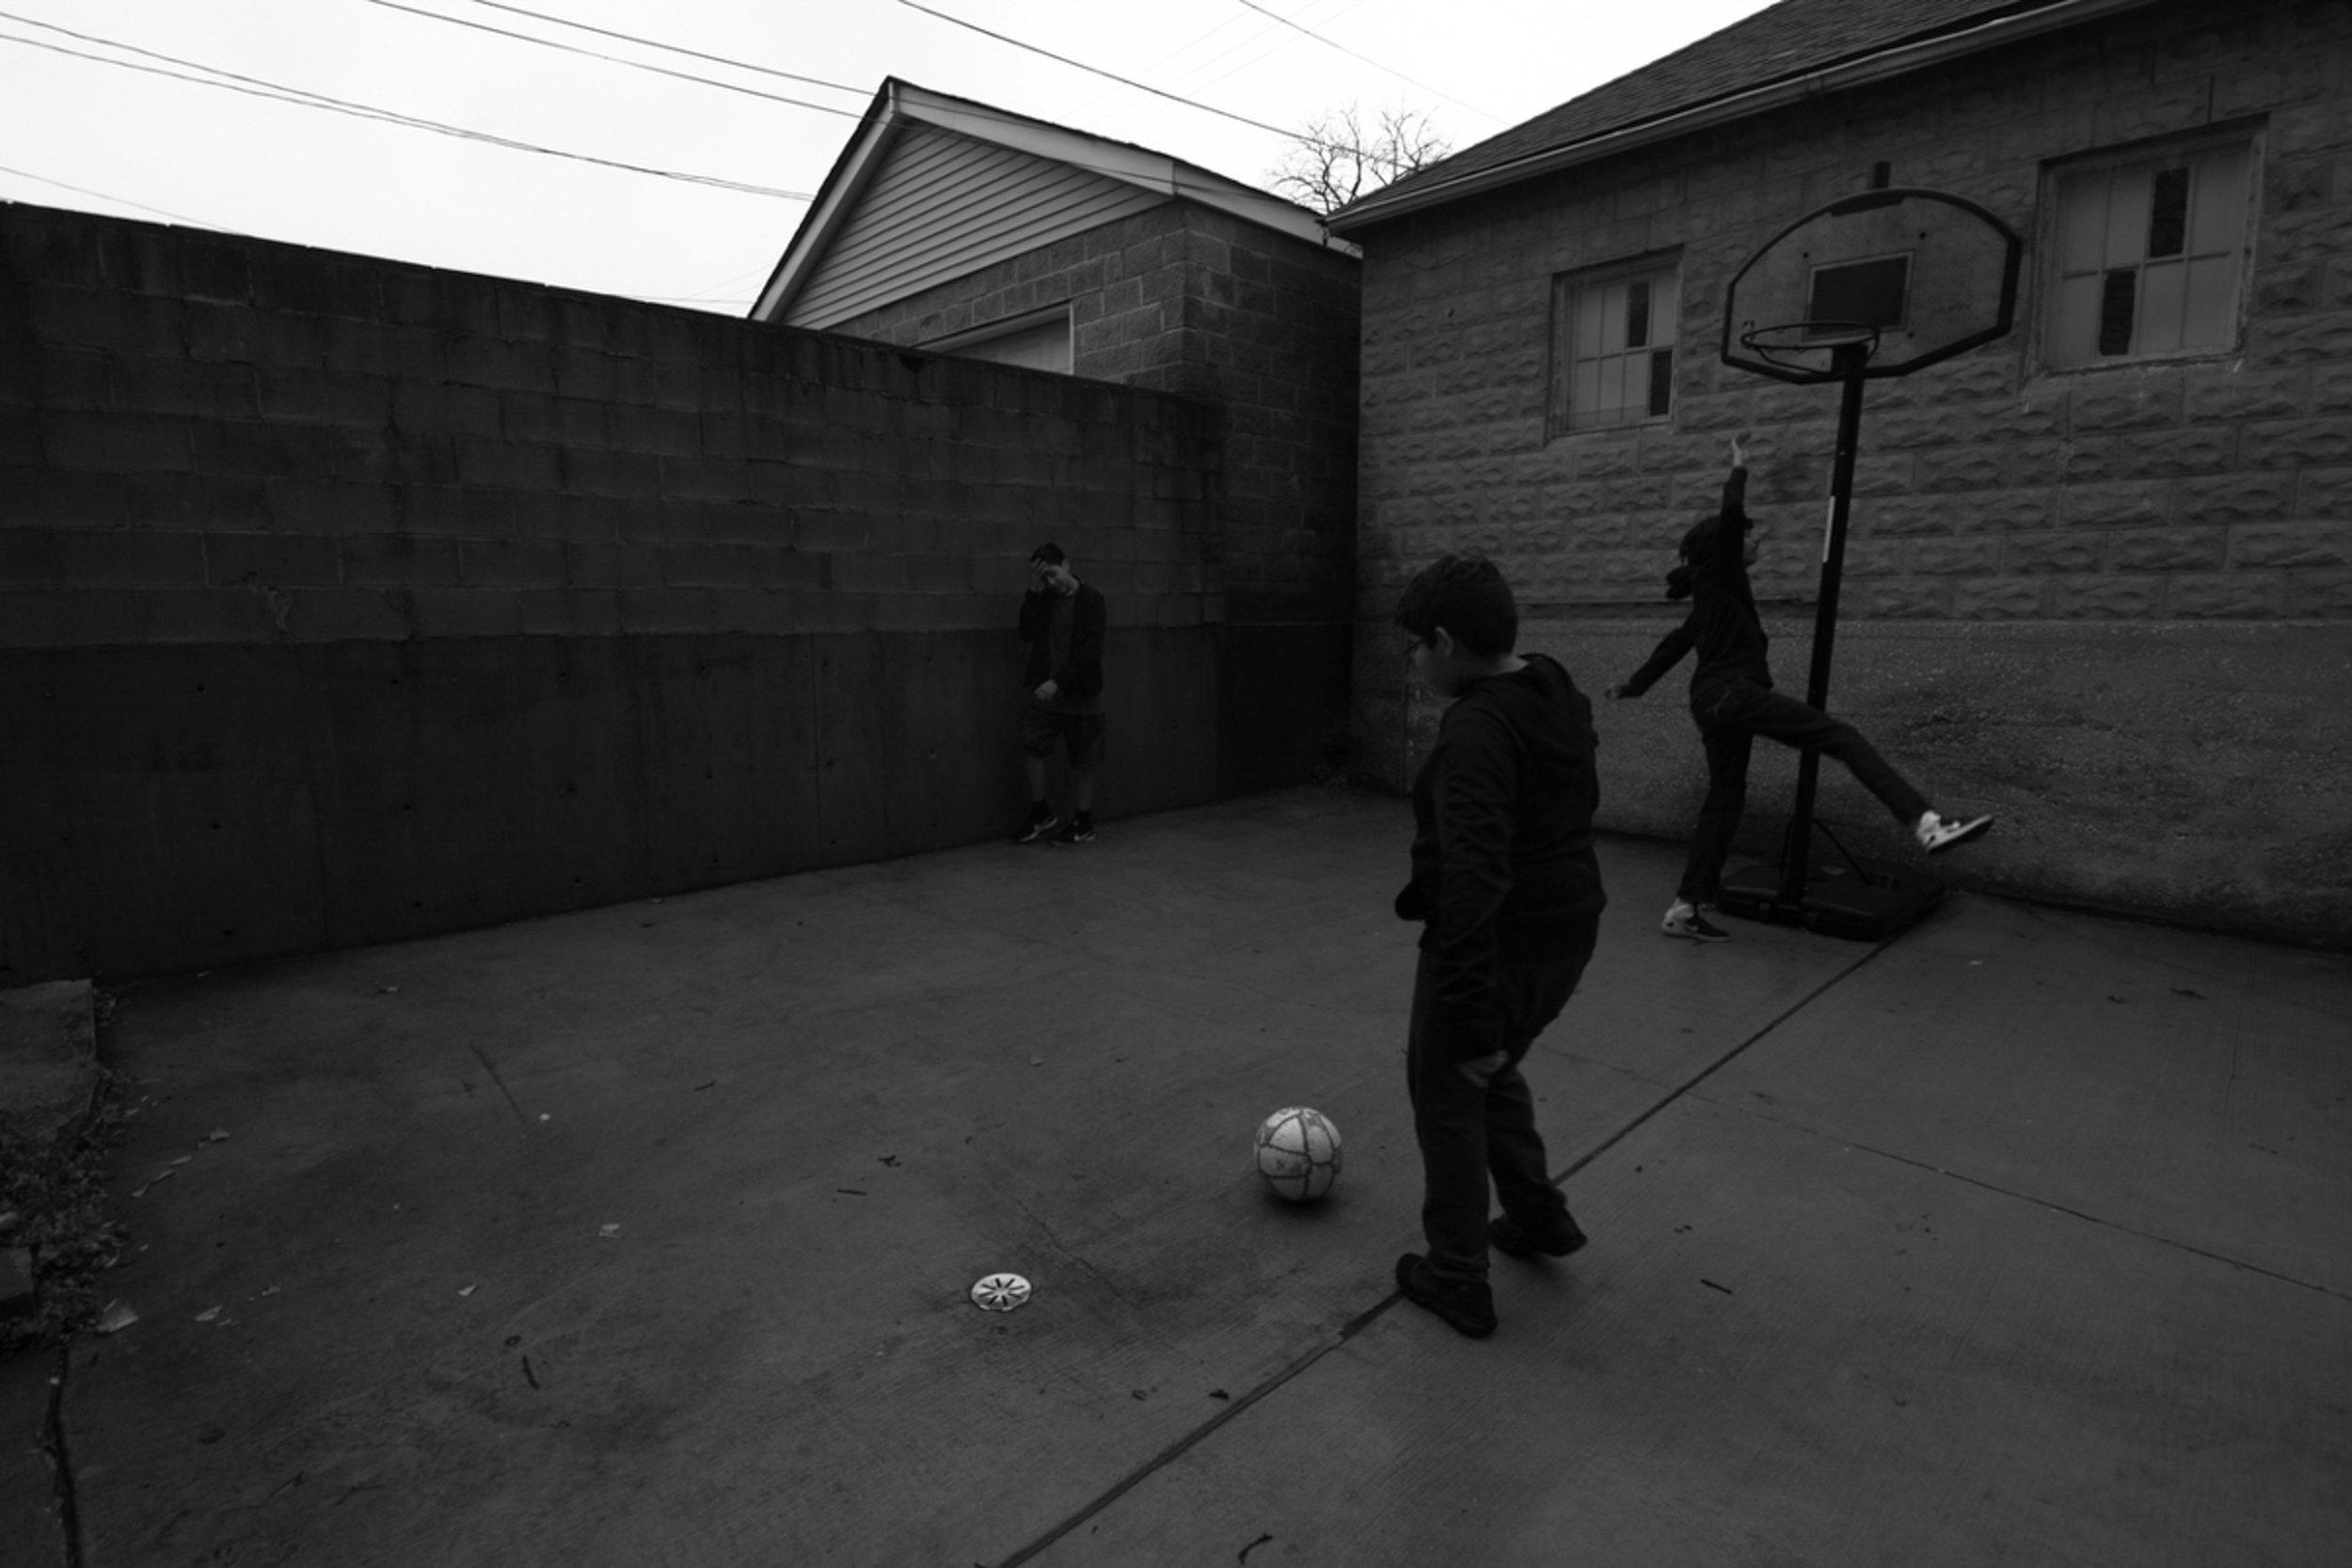 Children play soccer in the rain in their back yard on Nov. 04, 2017 in Pilsen.